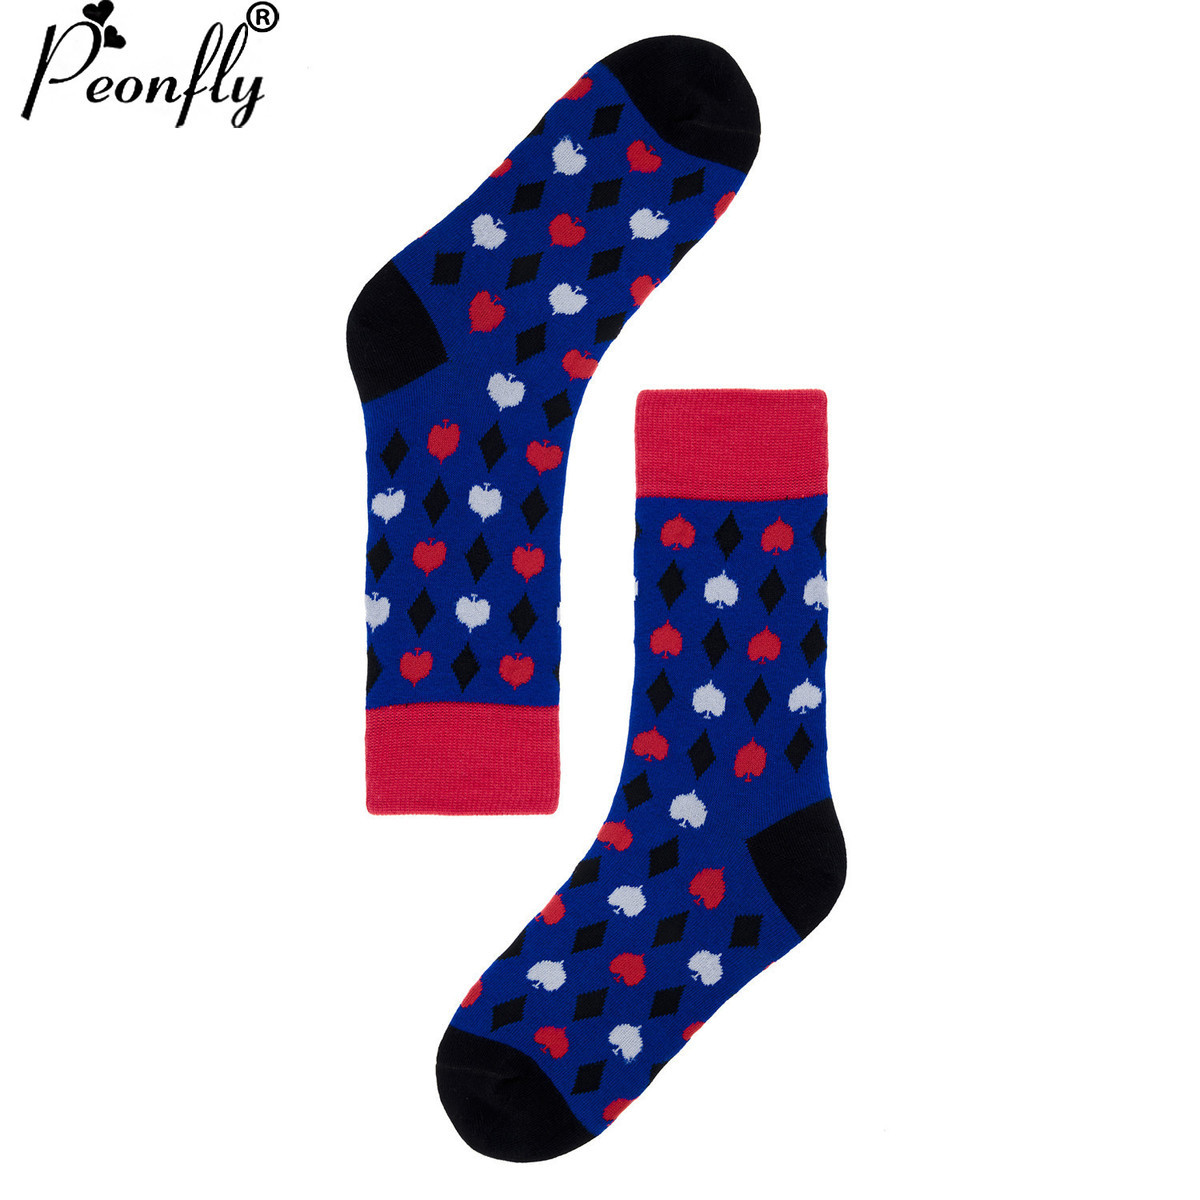 PEONFLY USA(6-10) long dress high New Pattern Funny Socks men women happy Lovers Socks Male Cotton